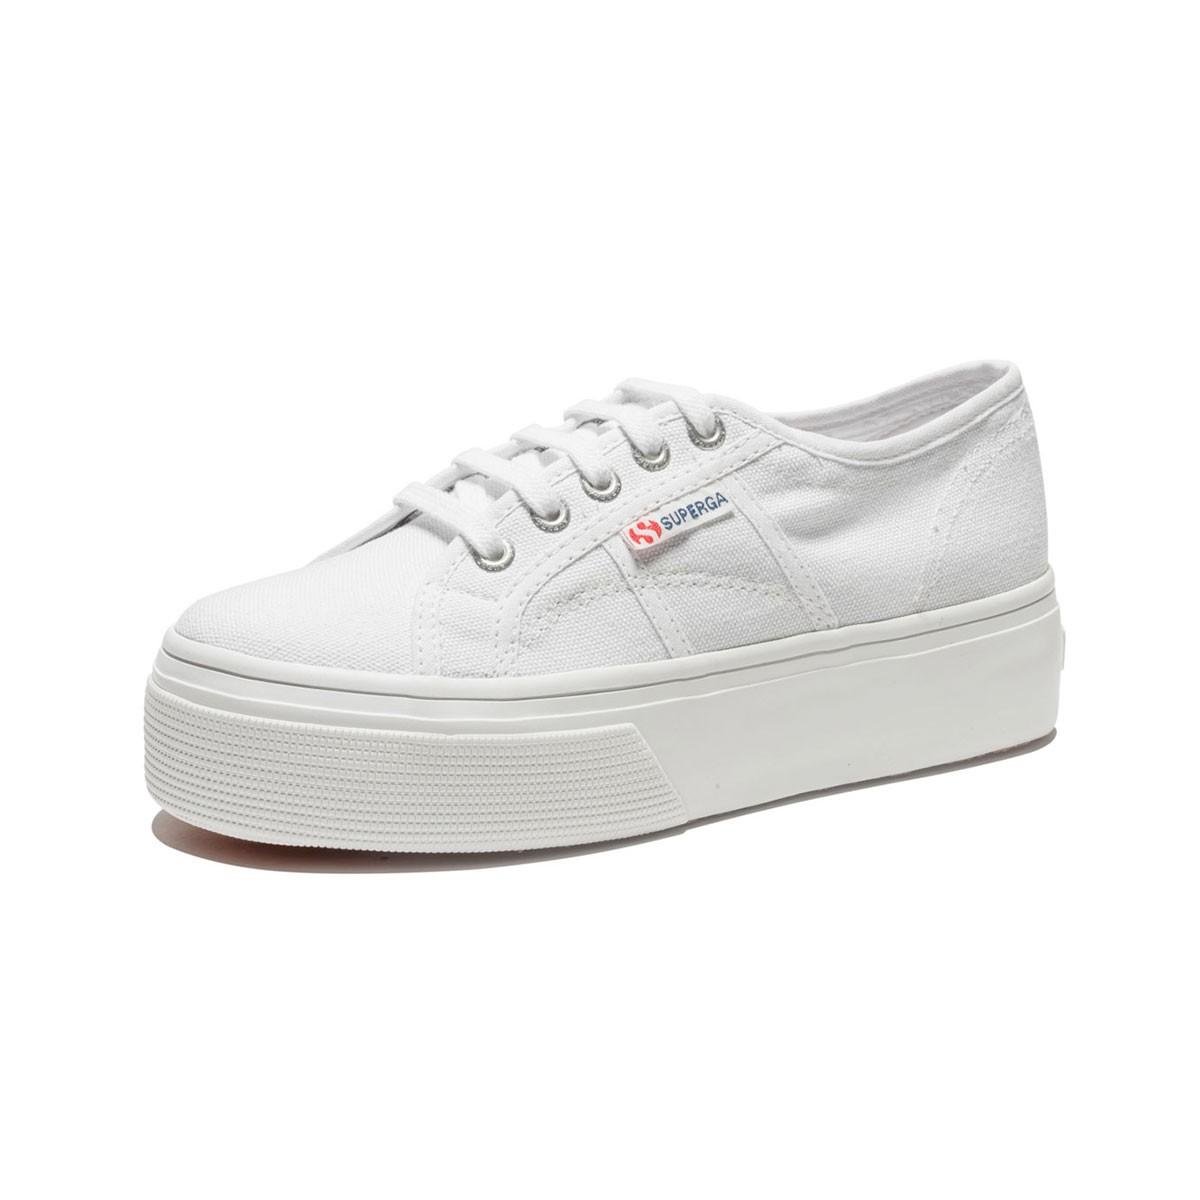 2790 COTU CLASSIC WHITE